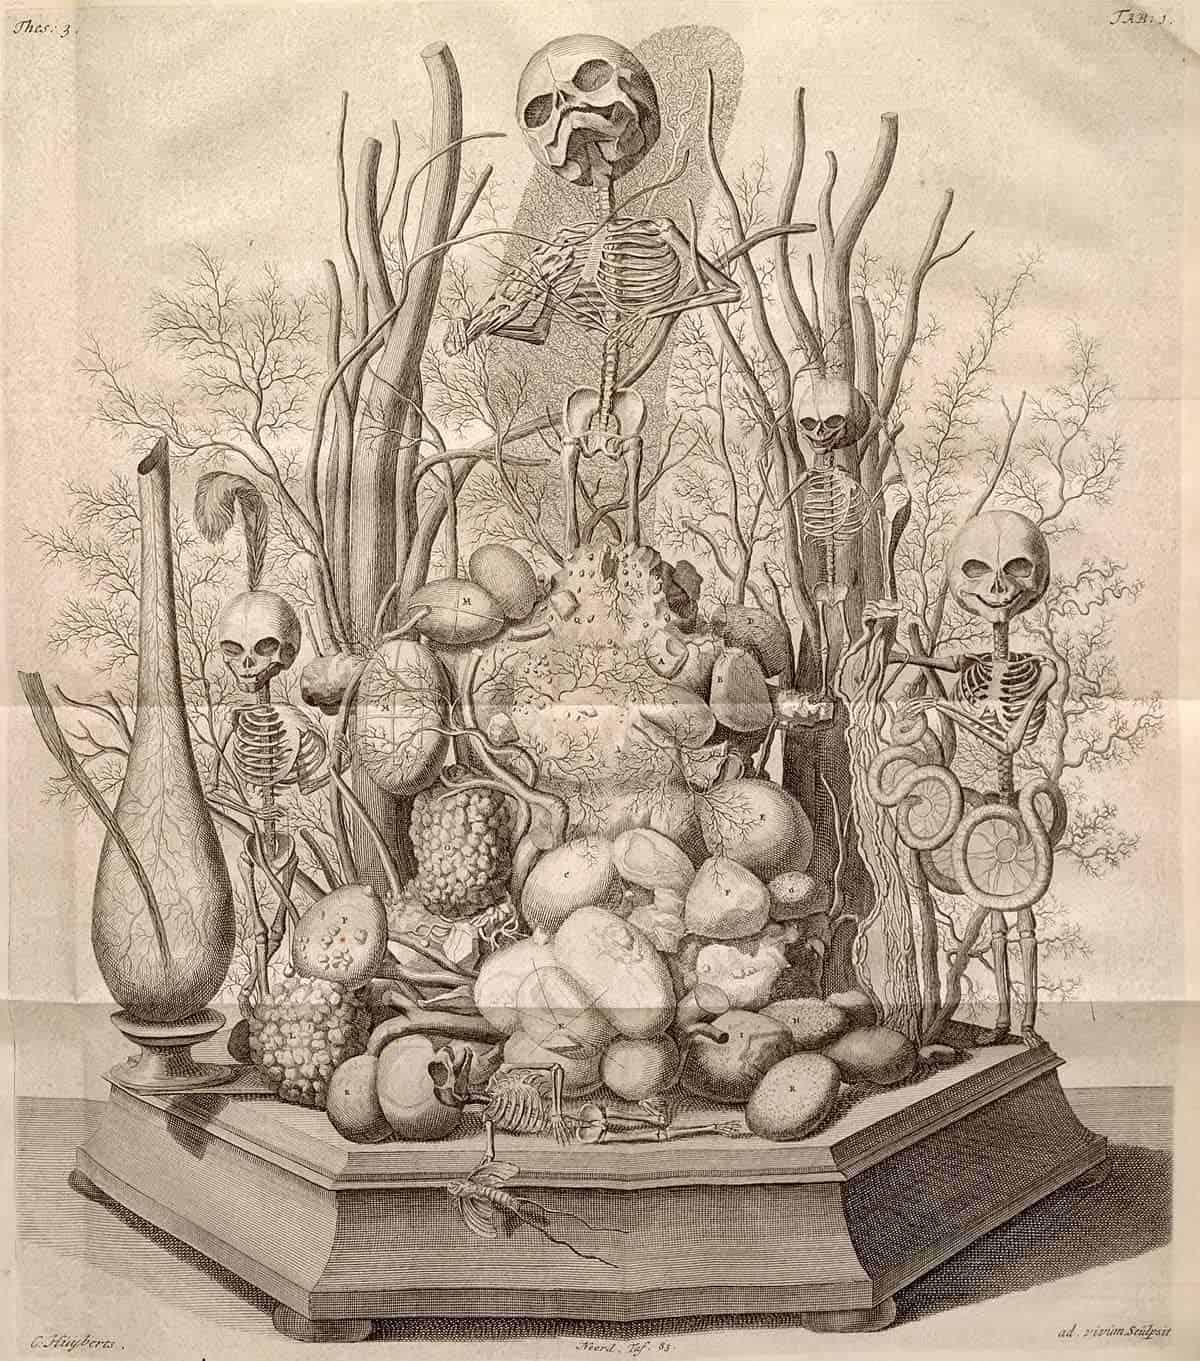 Cornelius Huyberts Vanitas-Diorama Frederik Ruysch 1721